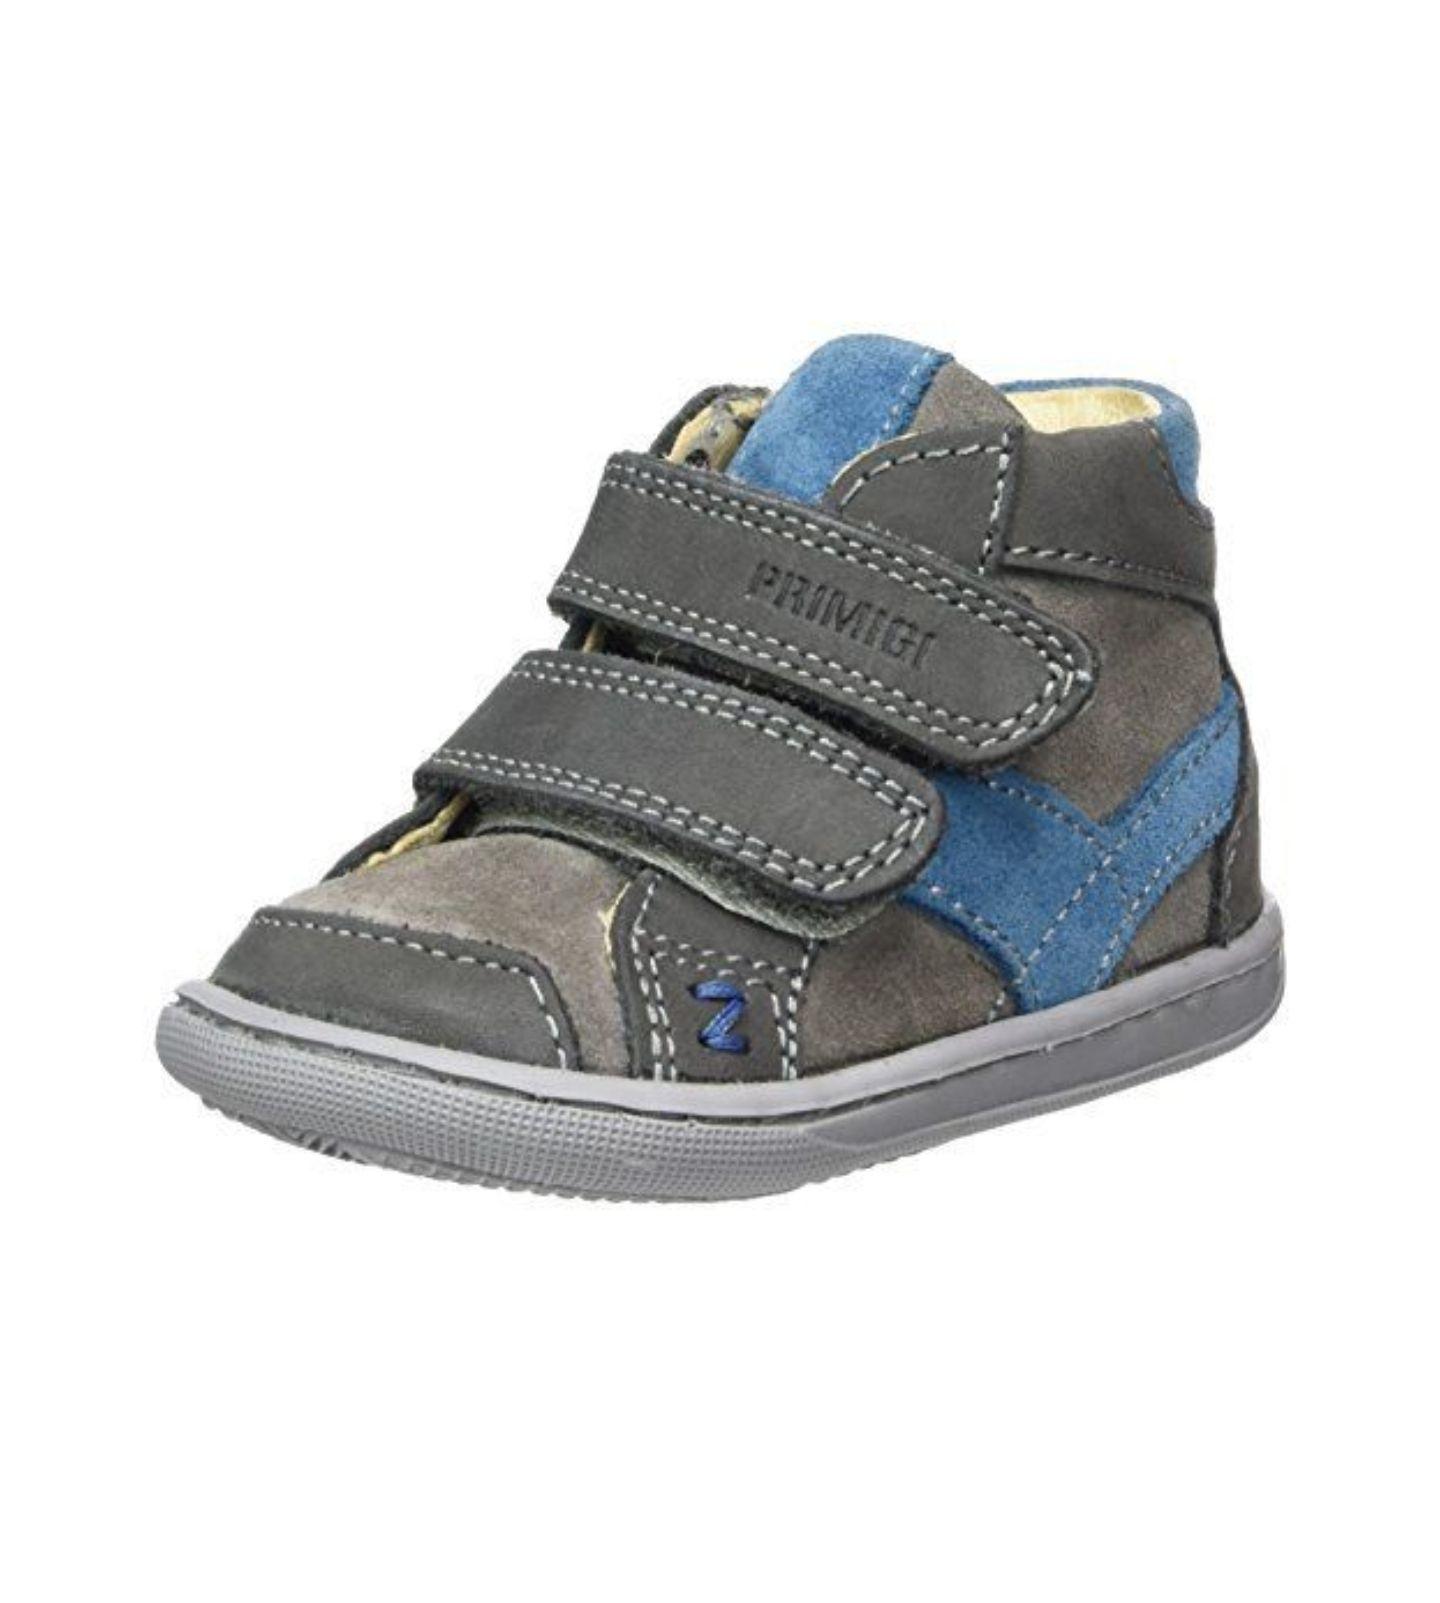 Primigi Baby Jungen PBX 8025 Sneaker, Grau (Antrac/Grigio), 22 EU